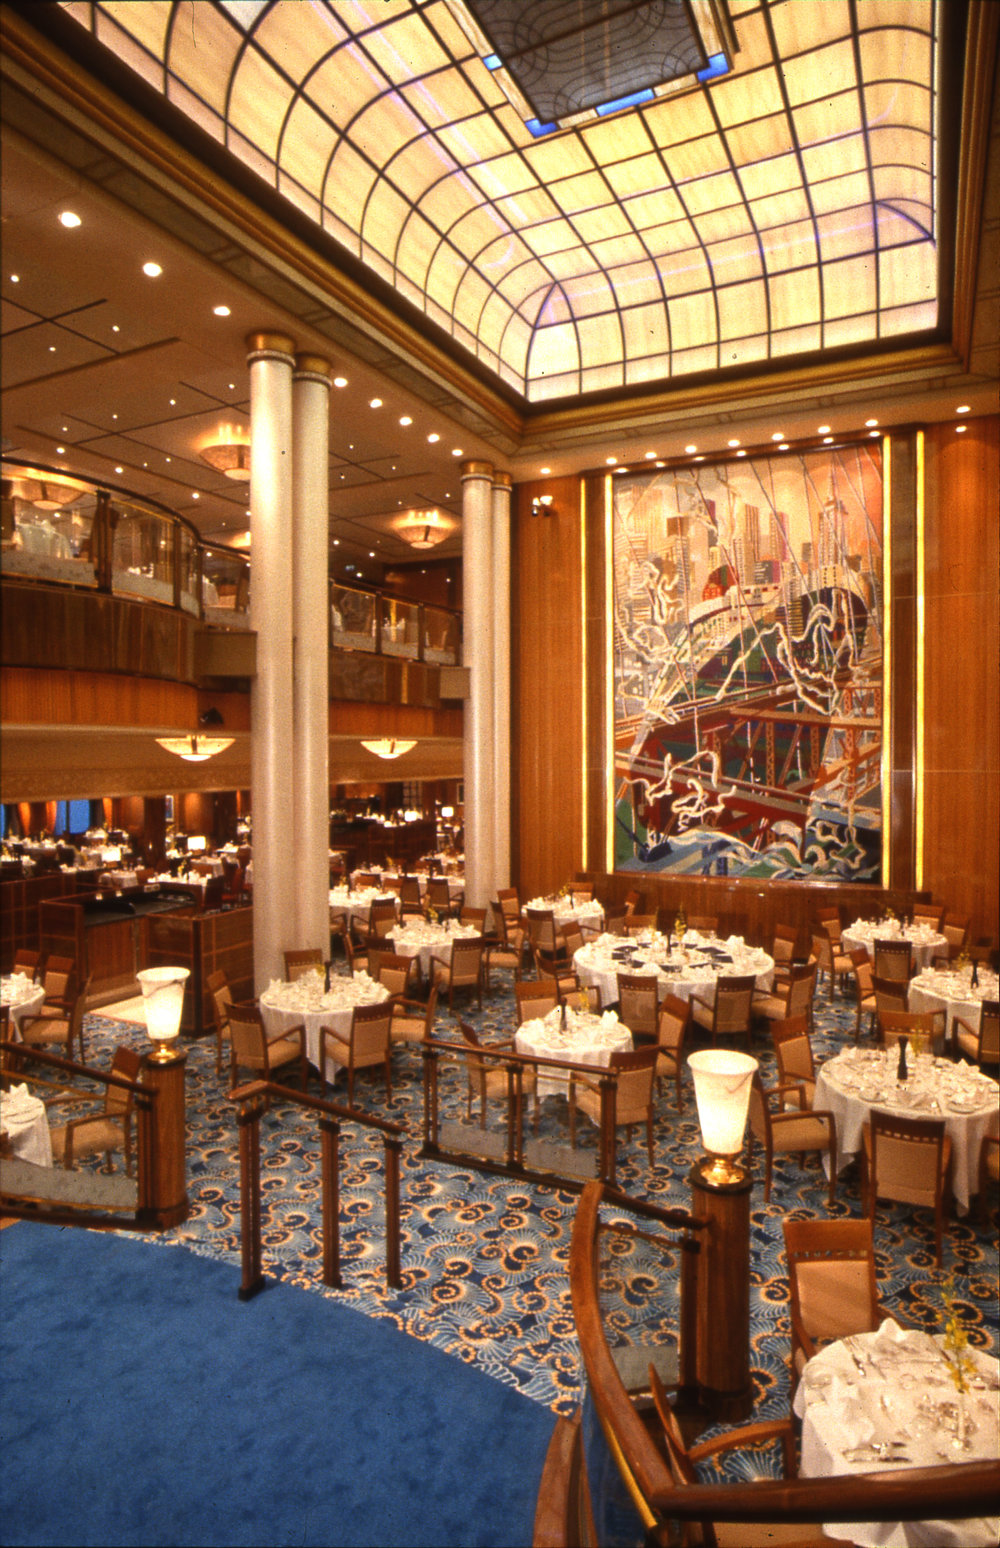 Brittannia restaurant, Queen Mary II